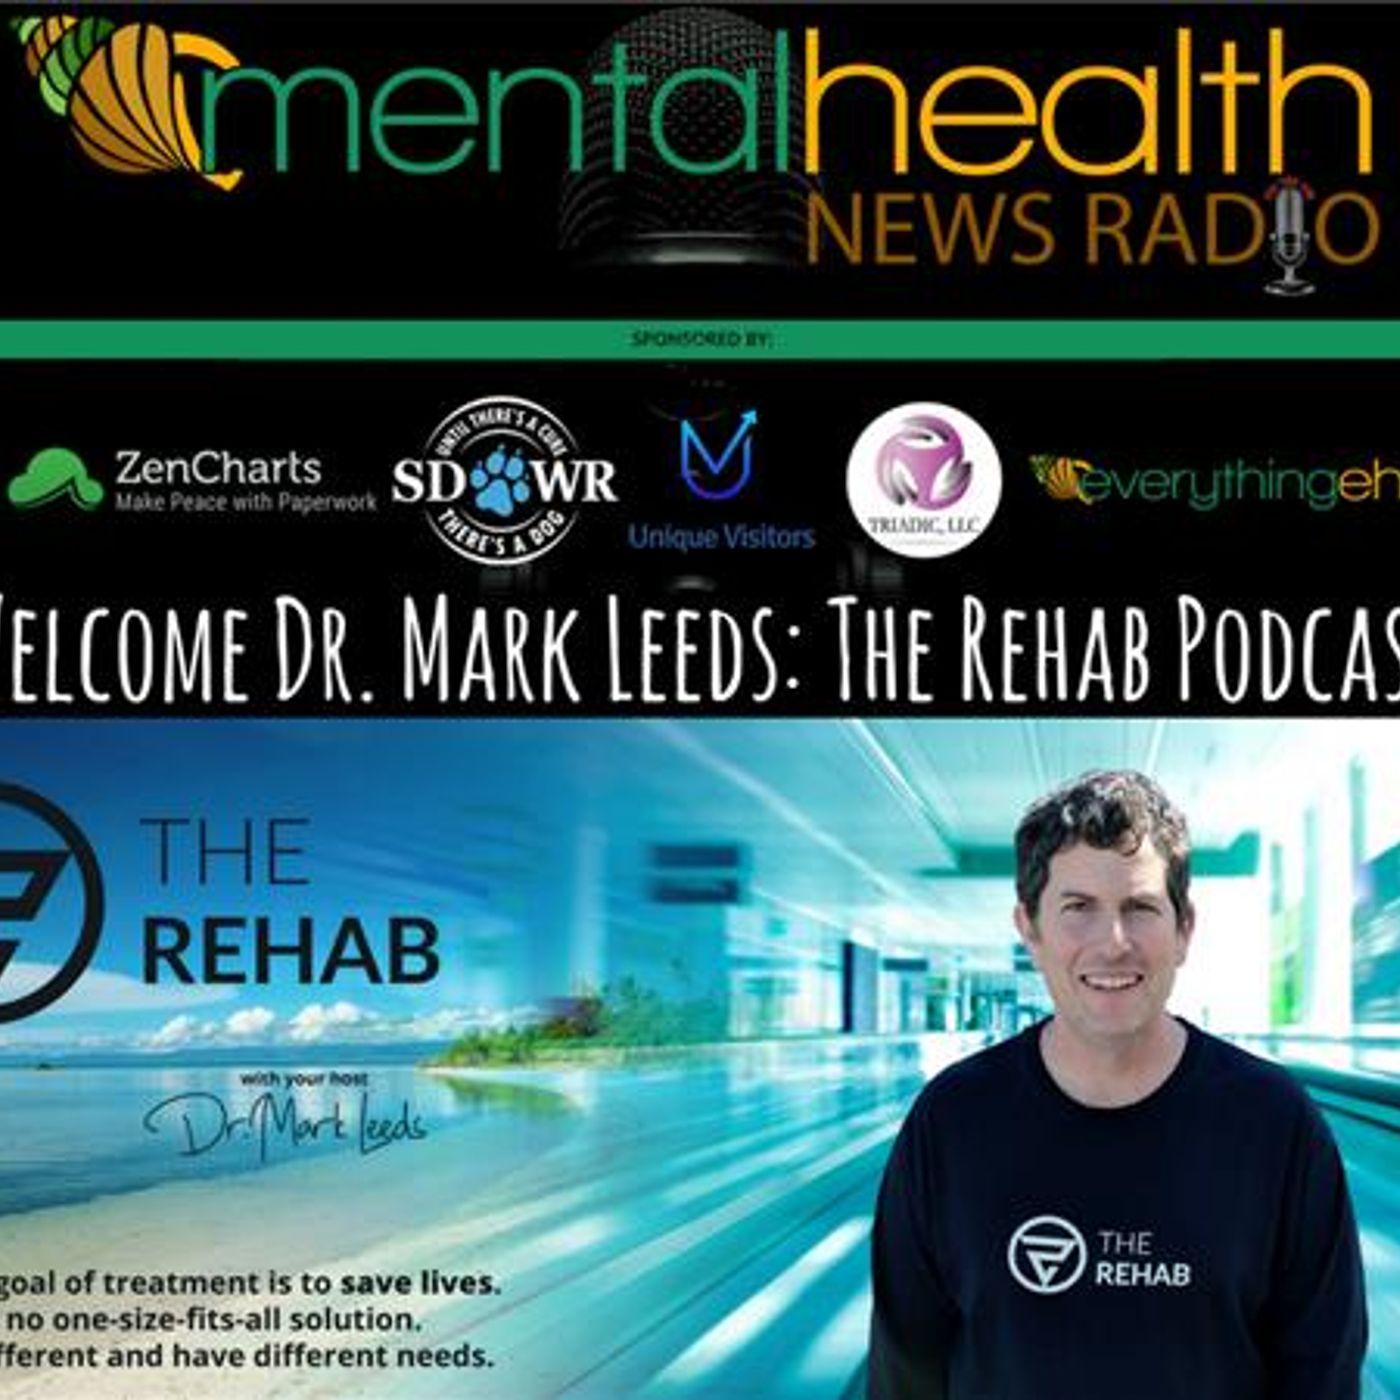 Mental Health News Radio - Welcome Dr. Mark Leeds: The Rehab Podcast